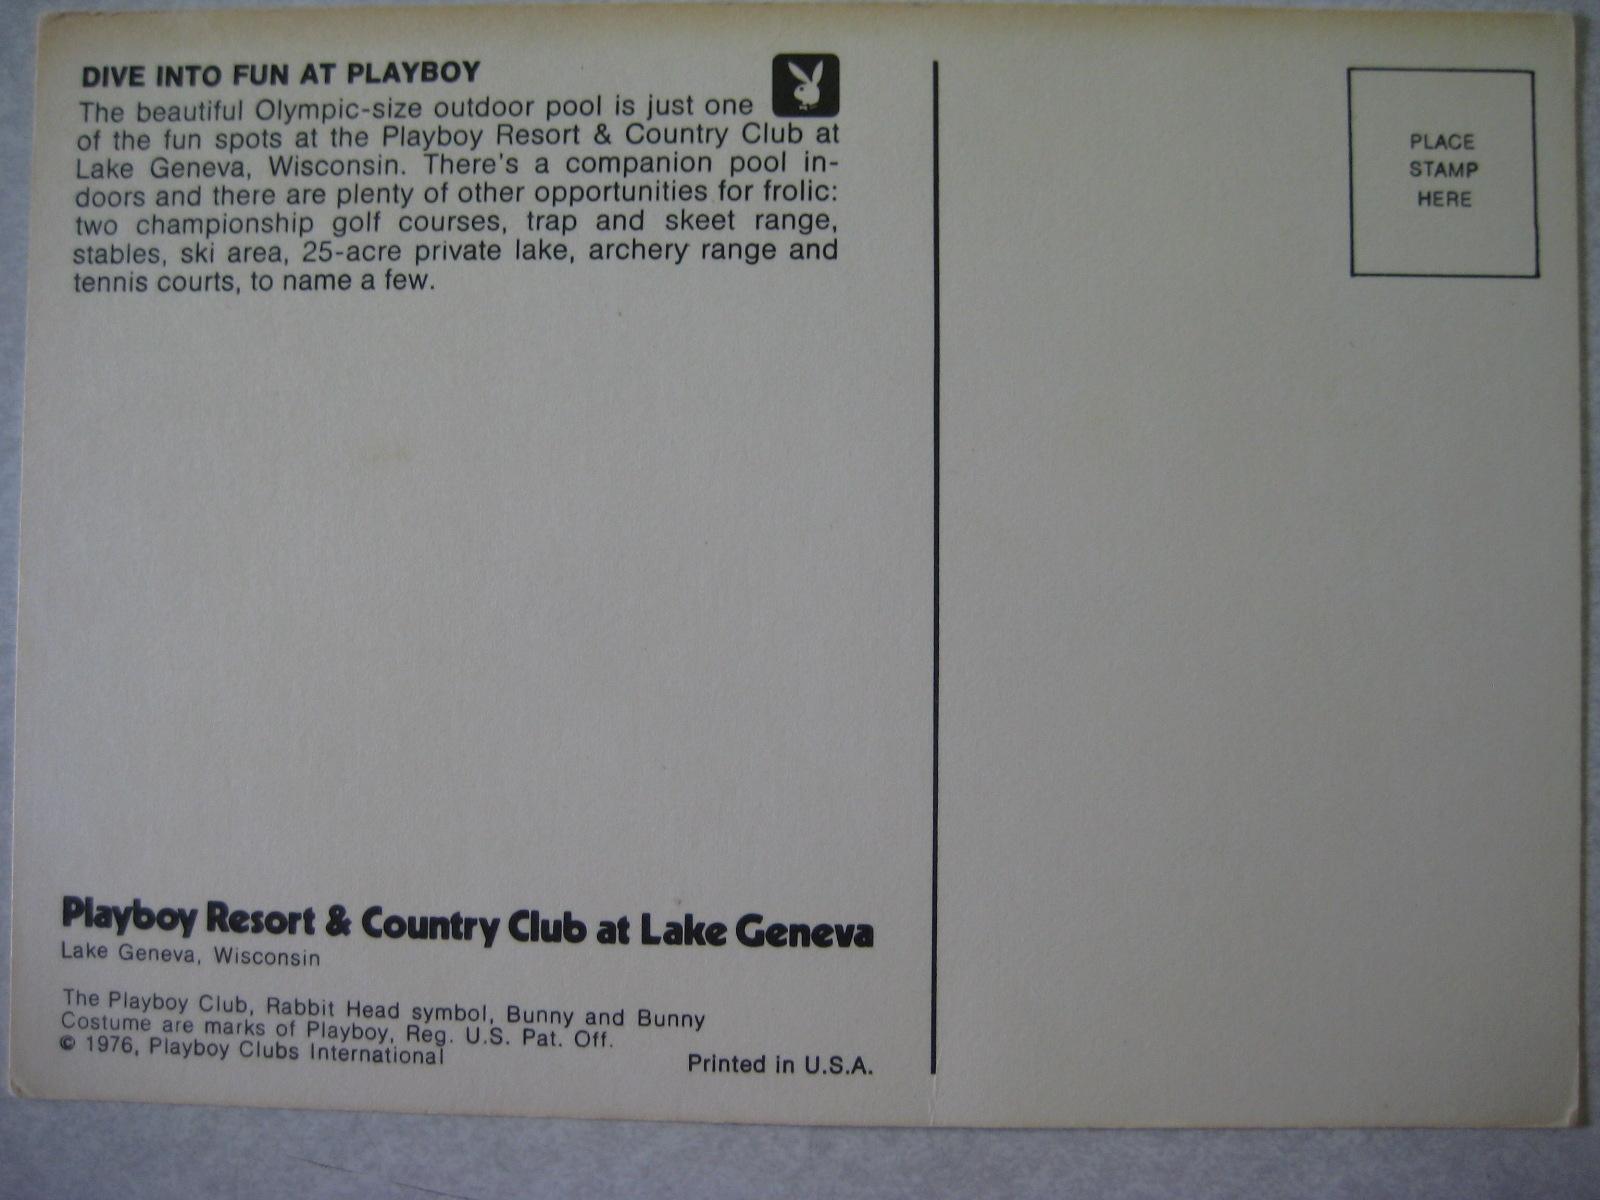 Lake Geneva Dive into Fun at Playboy Postcard 1976